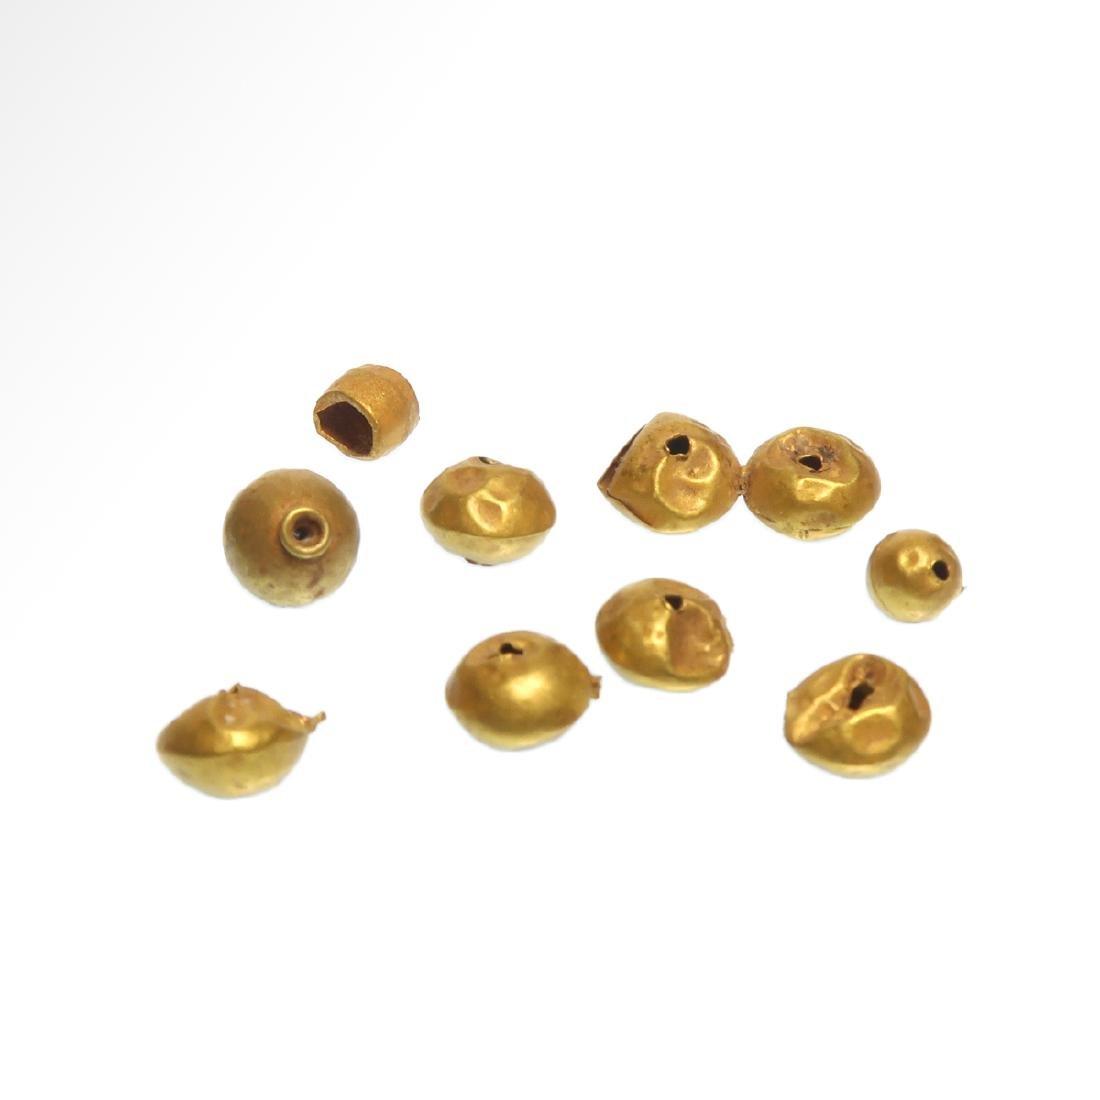 Forty-nine Roman Gold Beads, c. 1st Century A.D. - 3